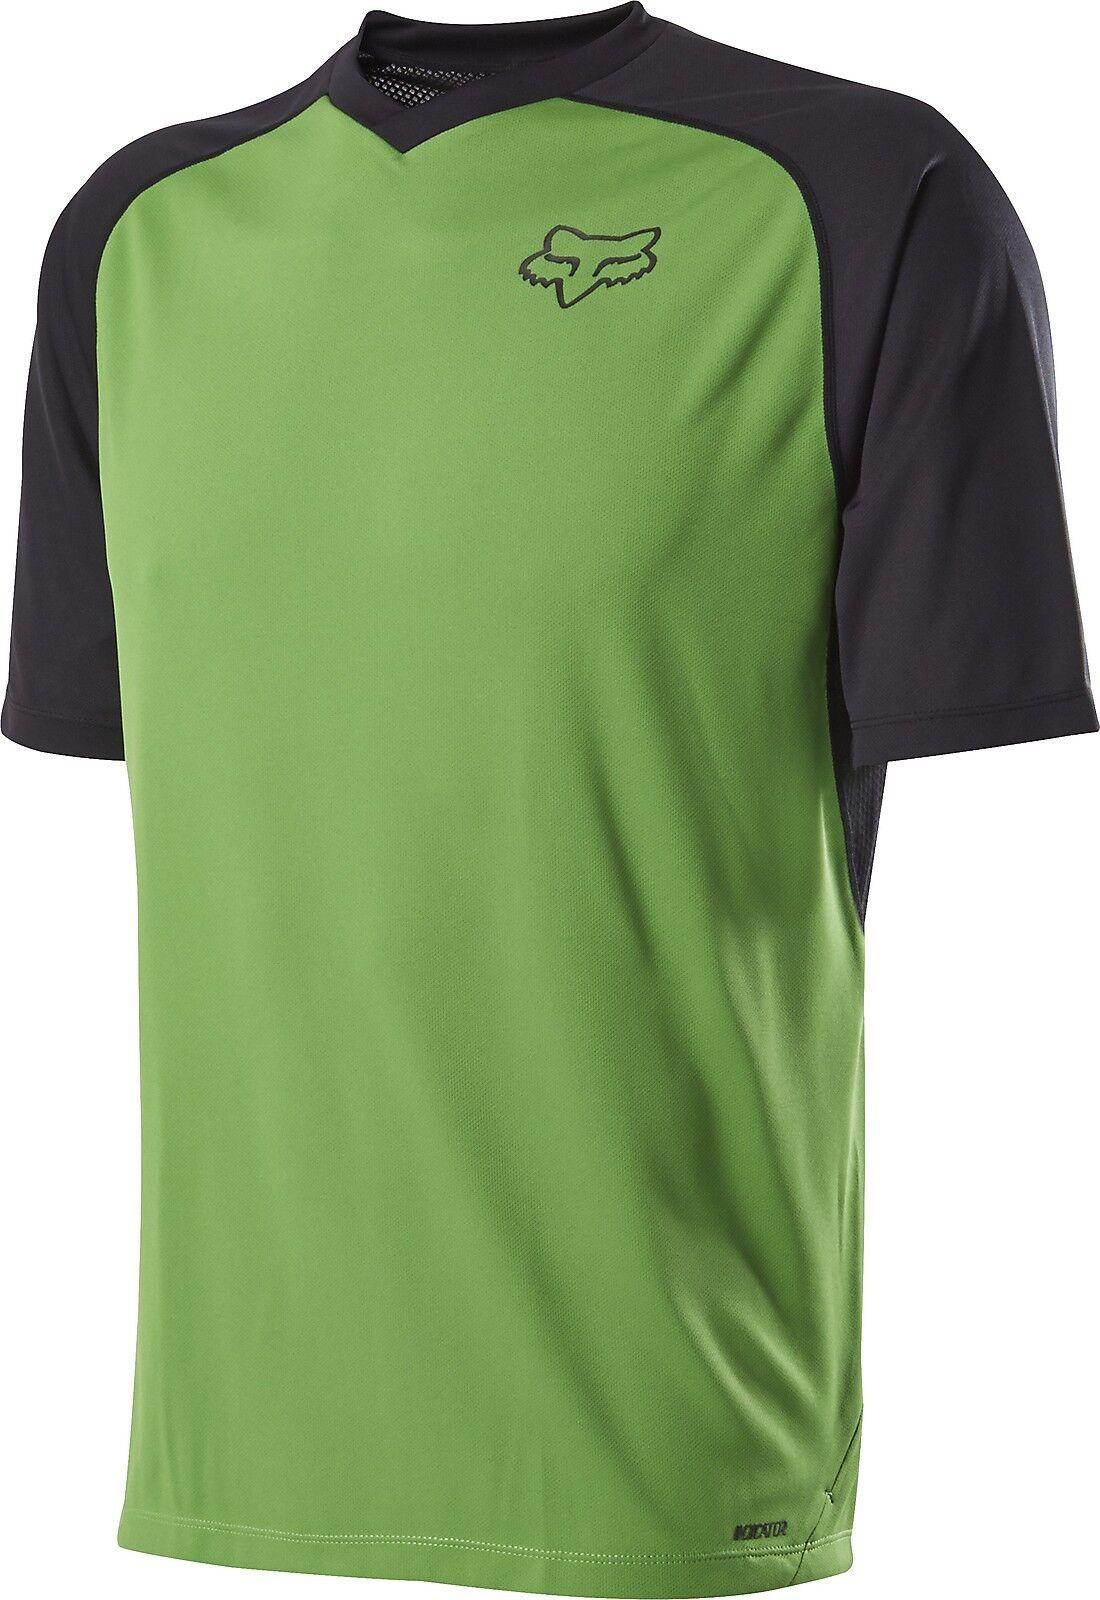 Fox Racing Indicator s s Jersey Green